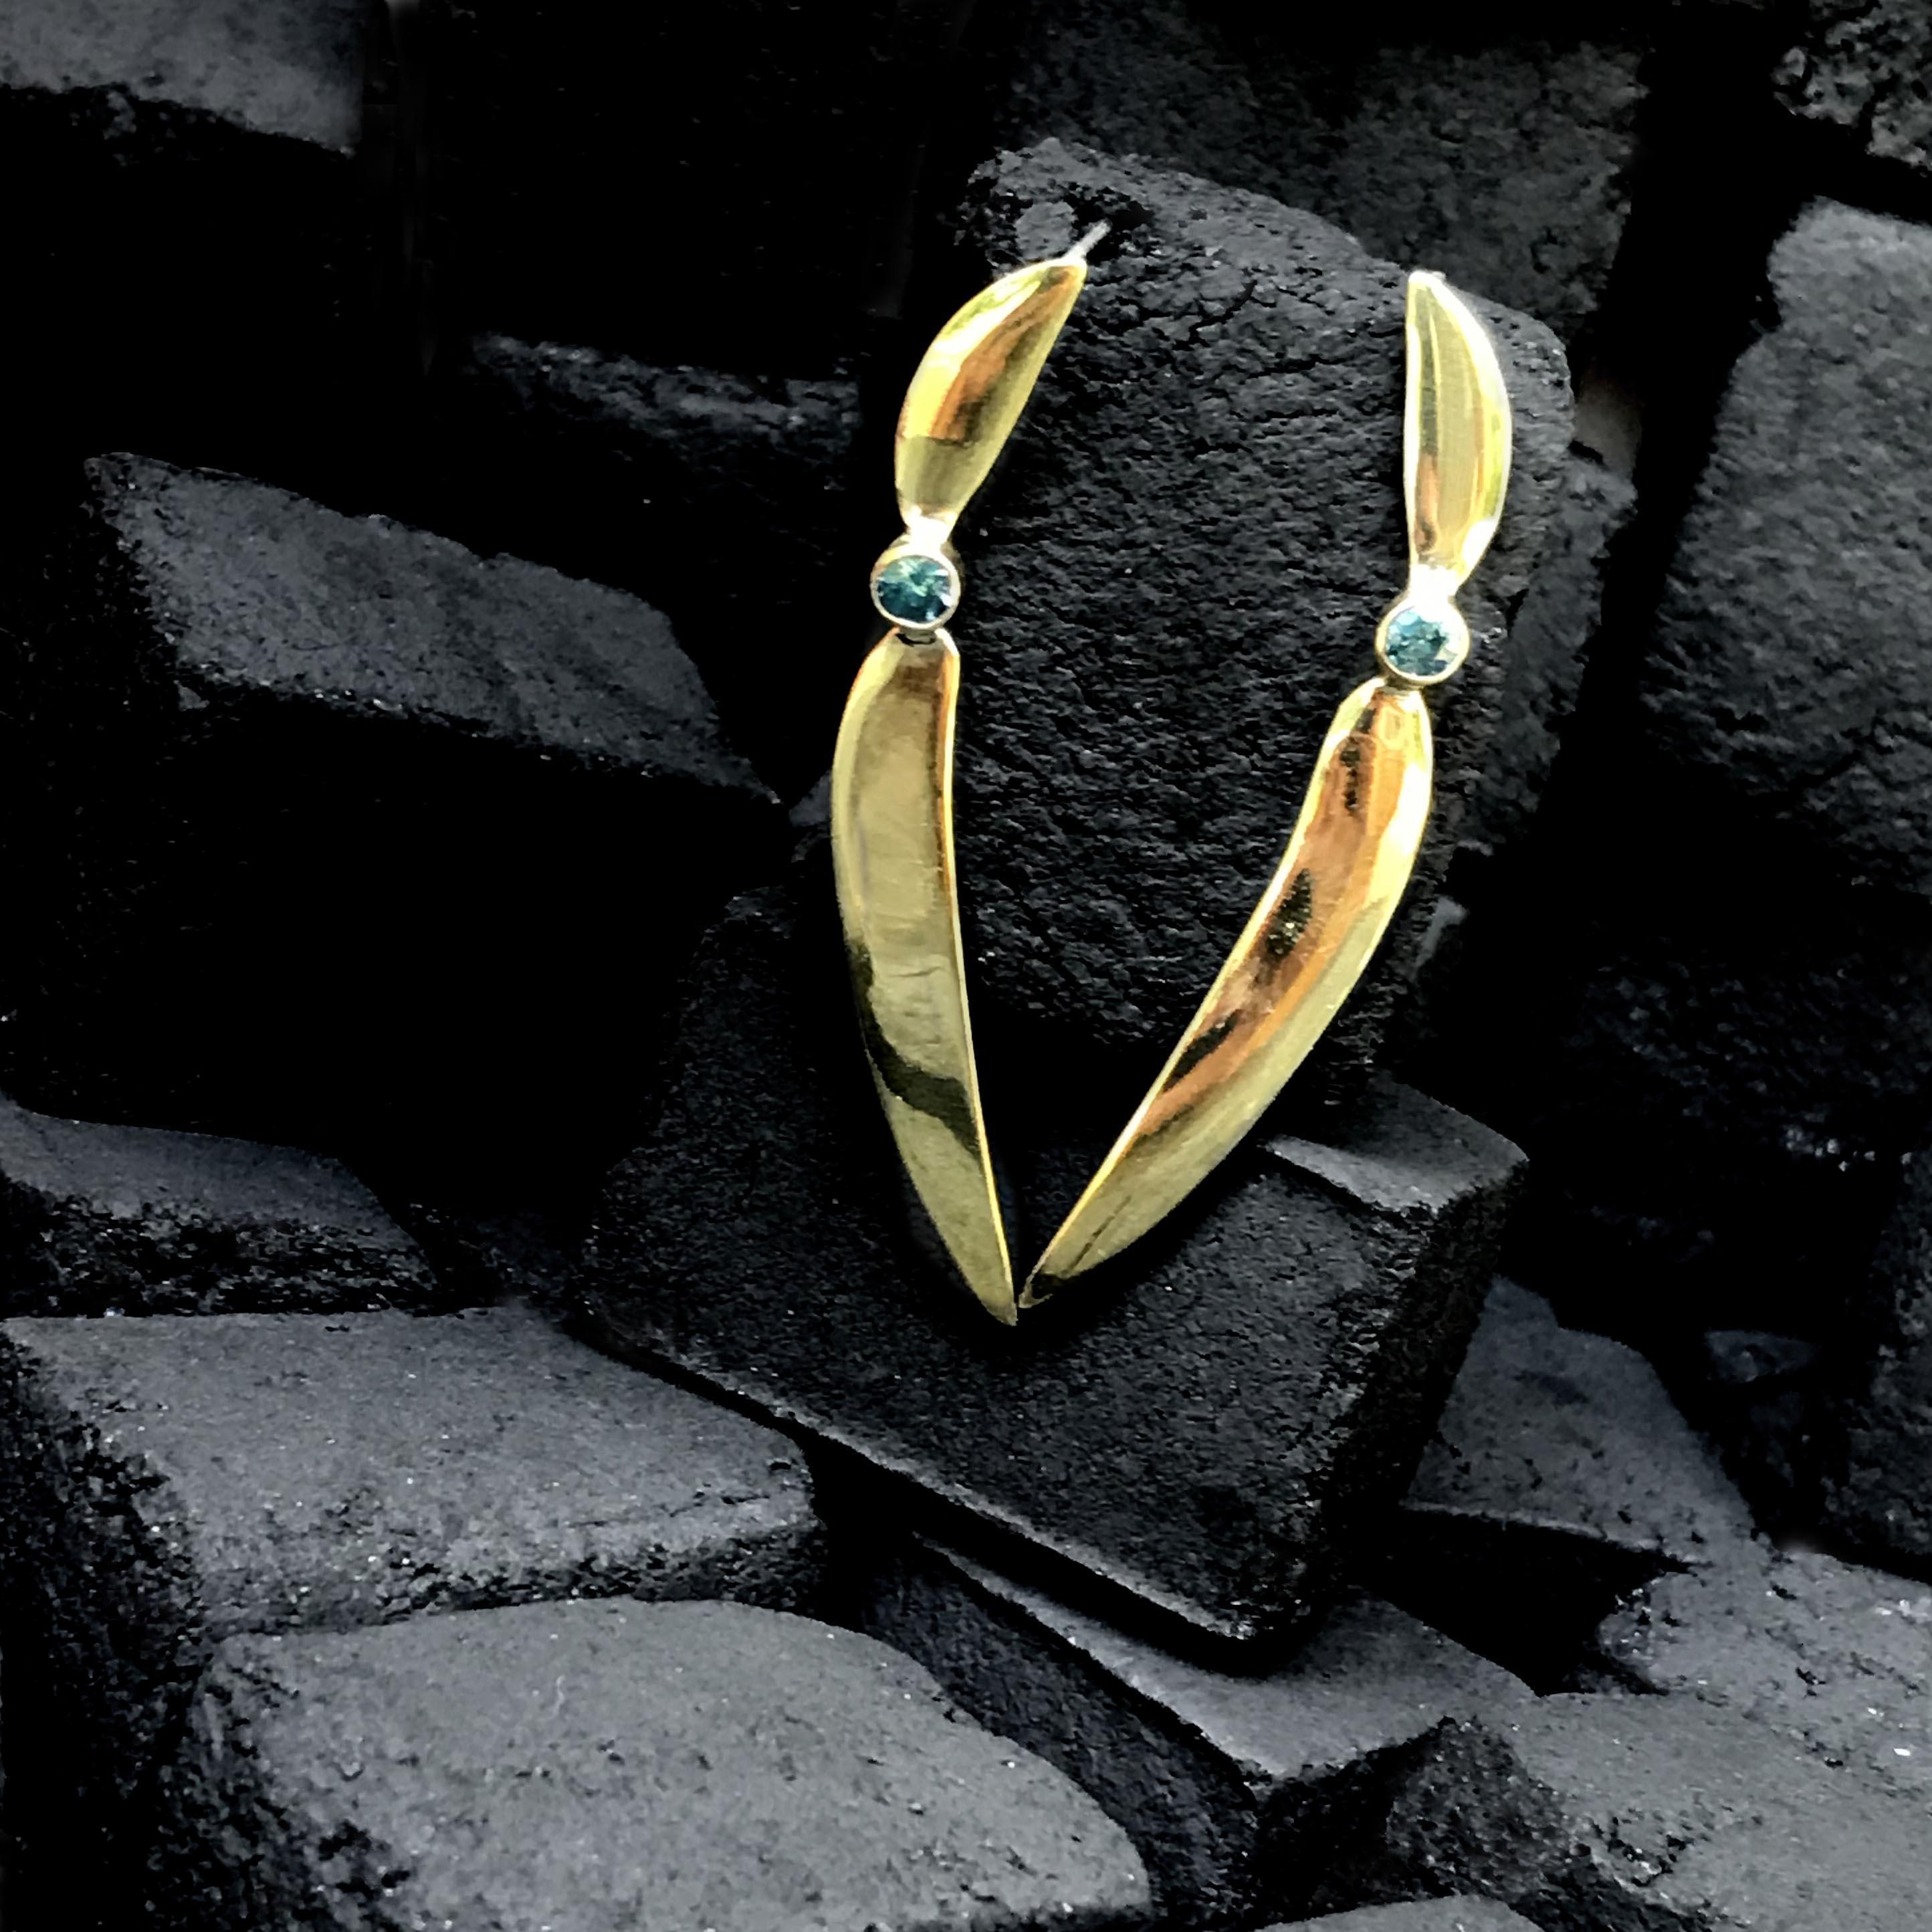 Earrings with zircon stones